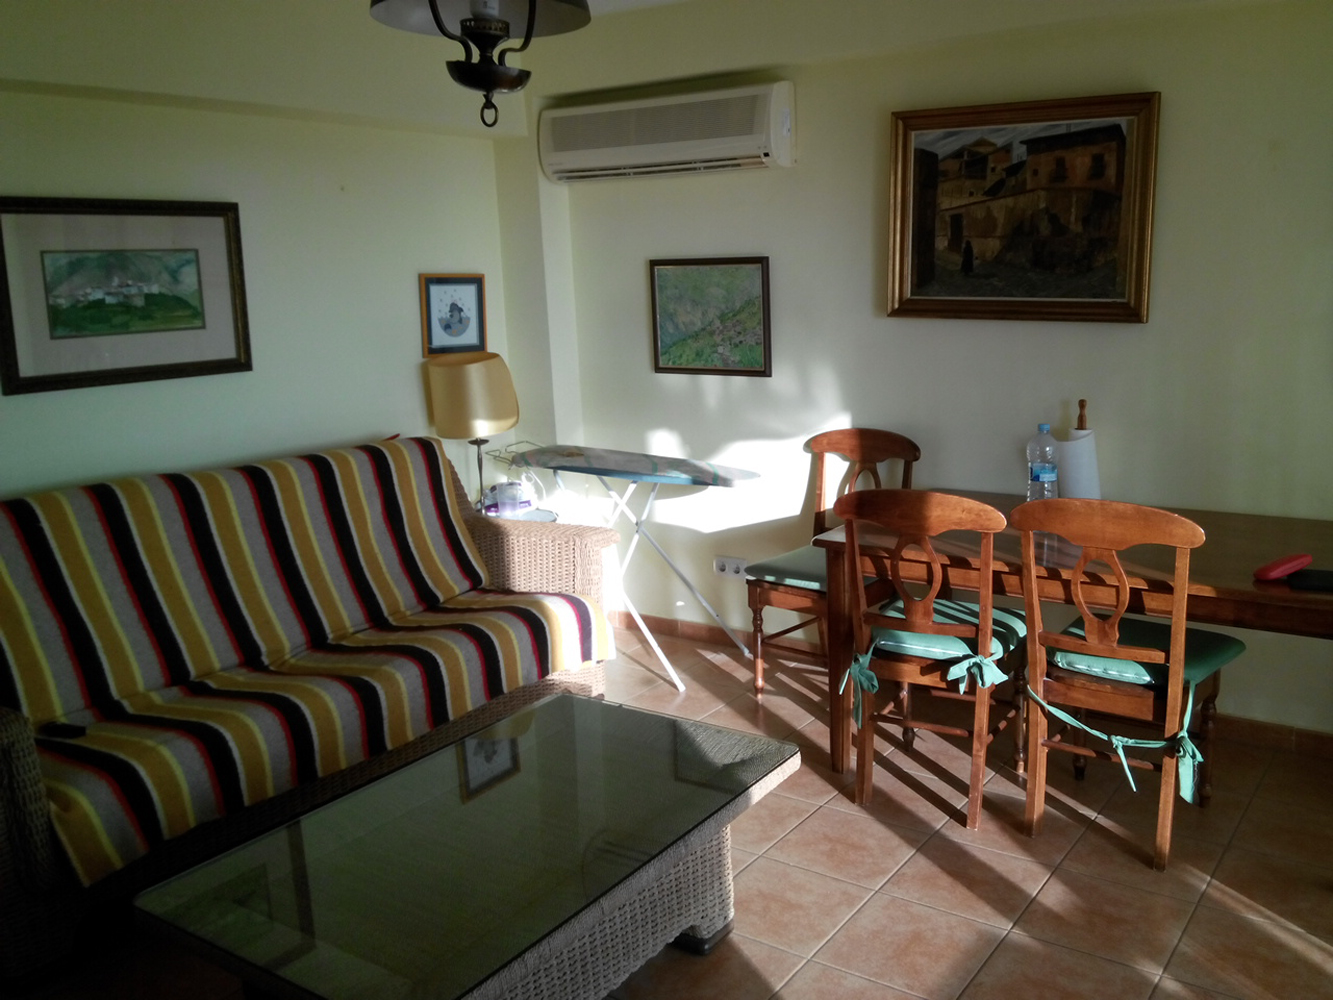 Apartamento torre de calpe en calpe comprar y vender casa en calp benidorm altea moraira - Compro apartamento en benidorm ...